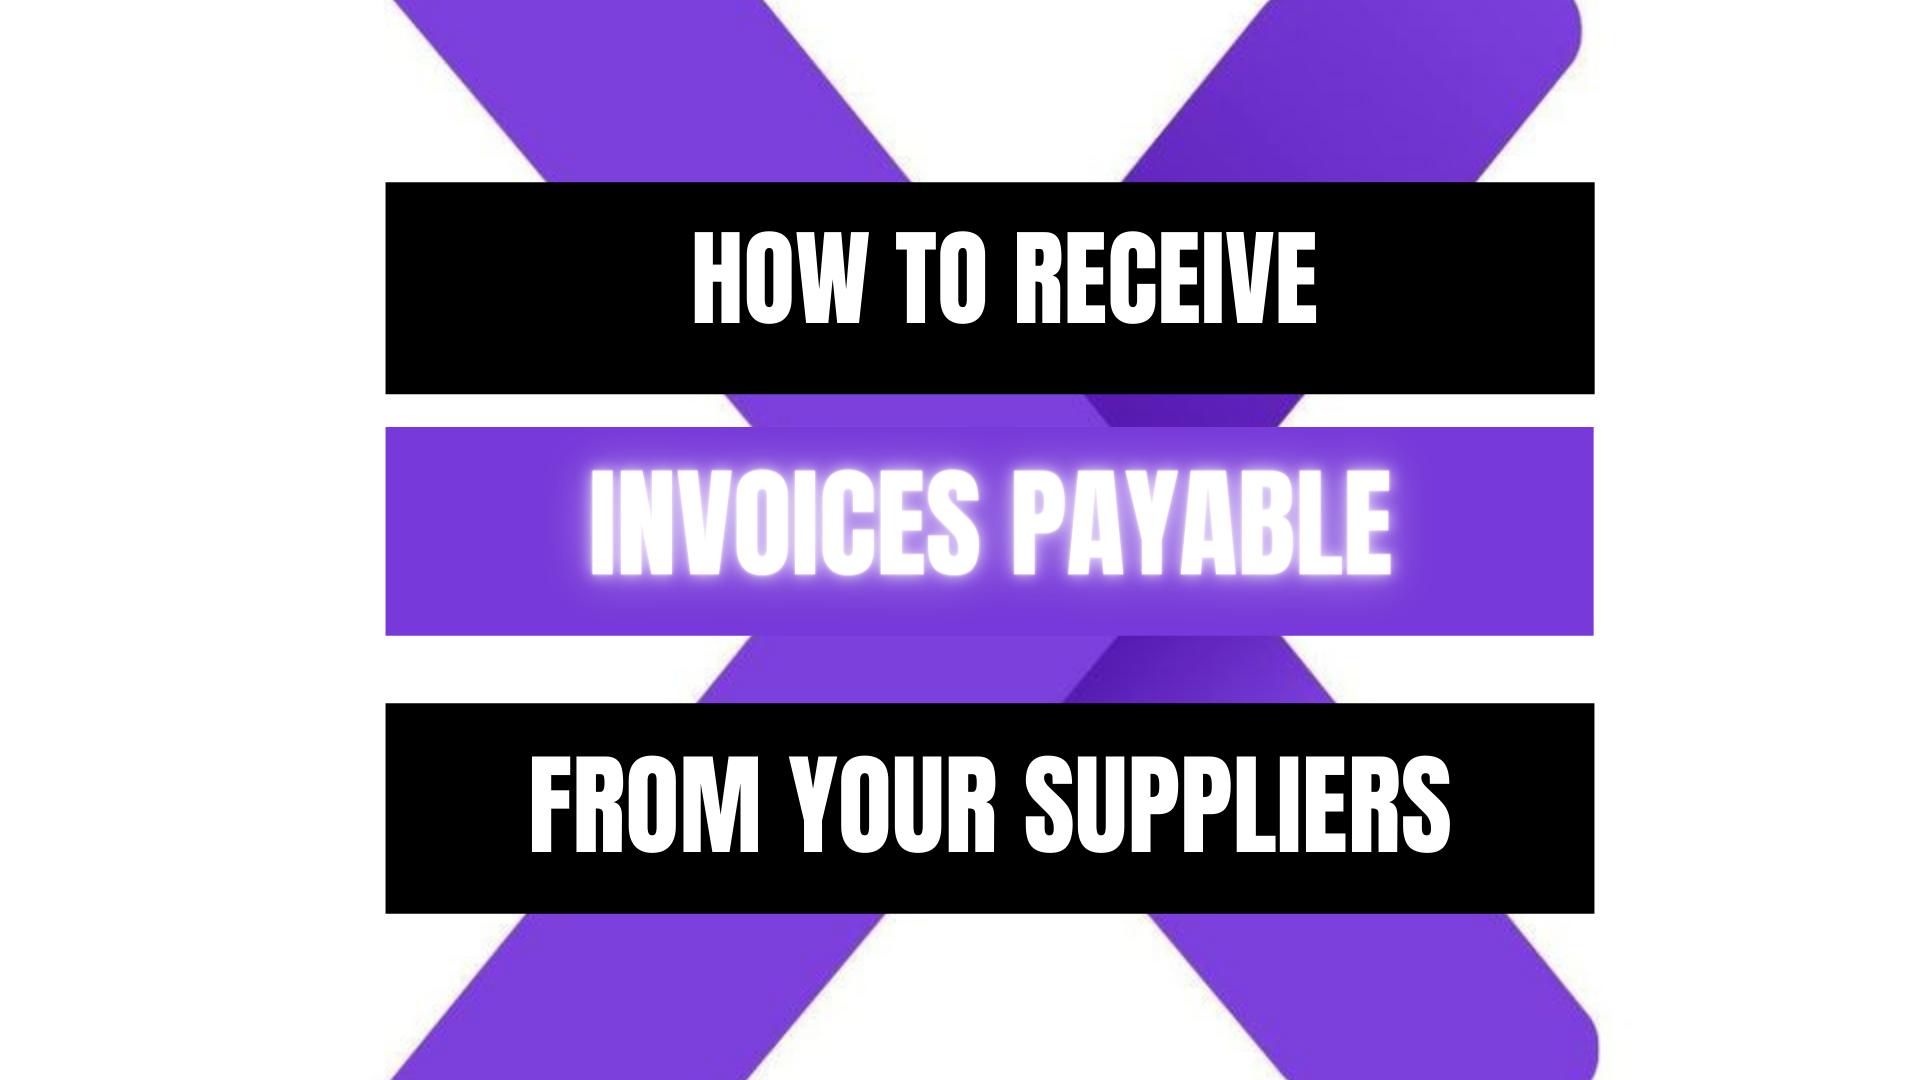 Peekaboox - Receive Invoices Payable